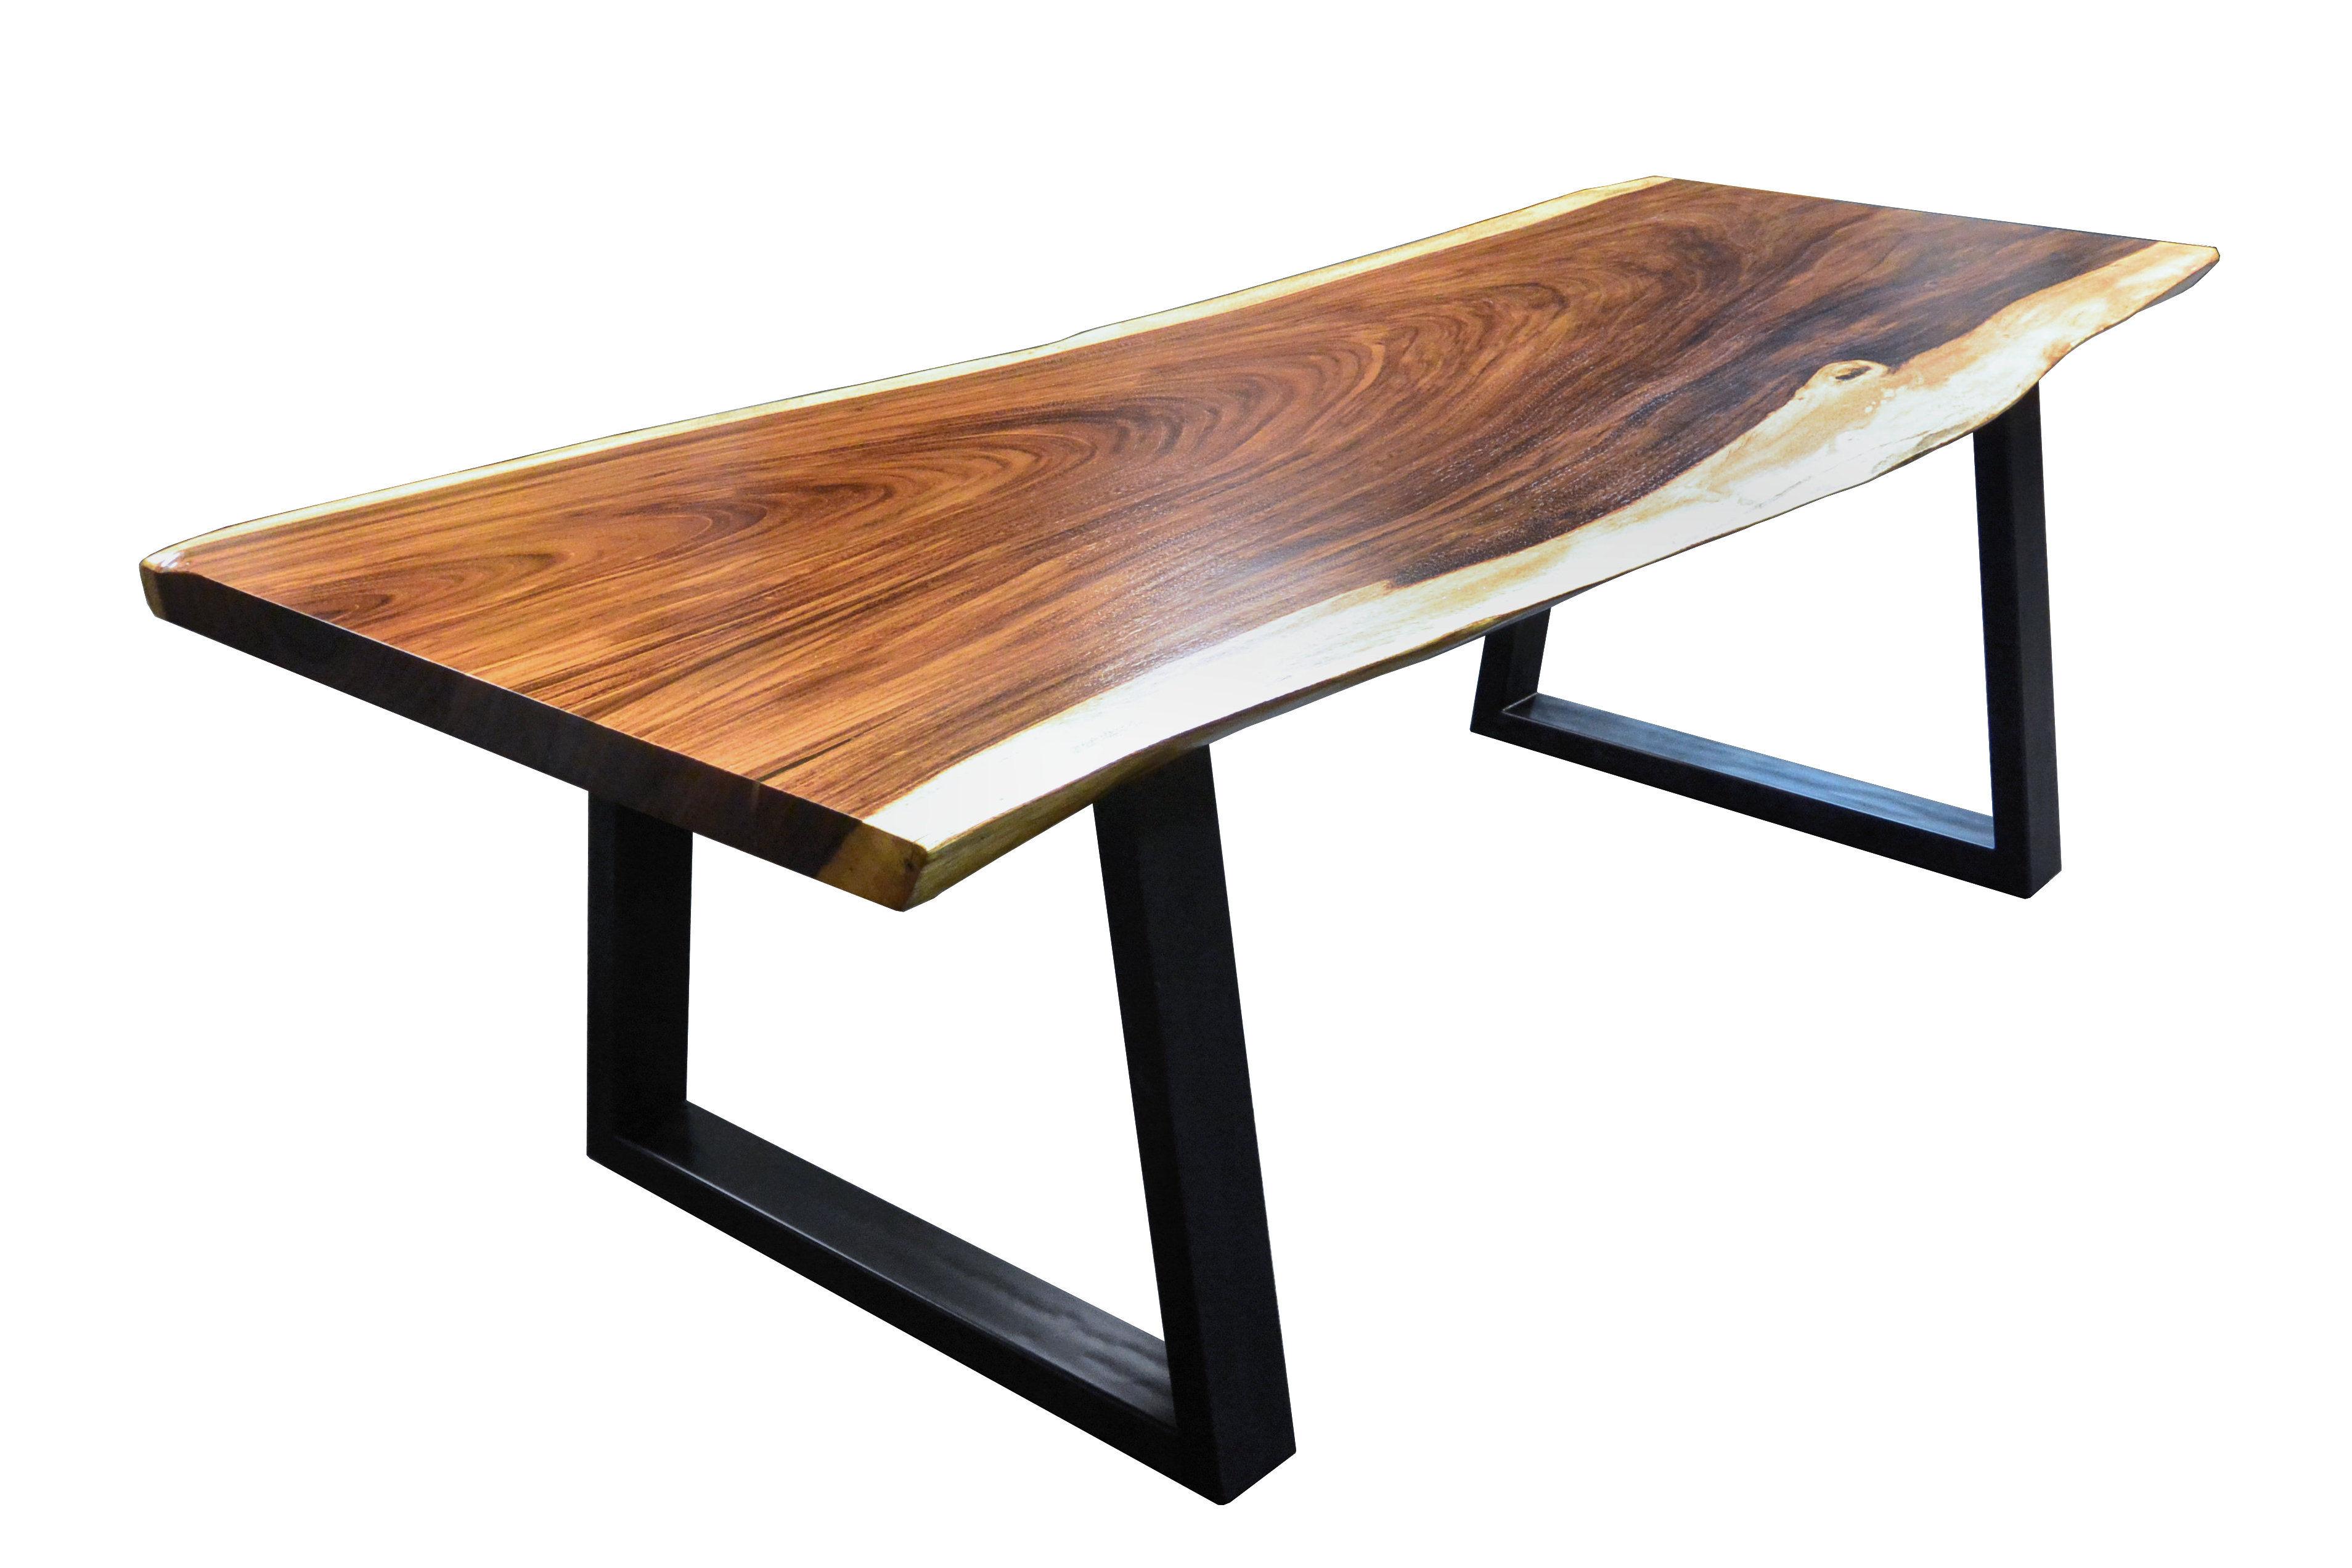 Guanacaste parota live edge wood slab countertop photo